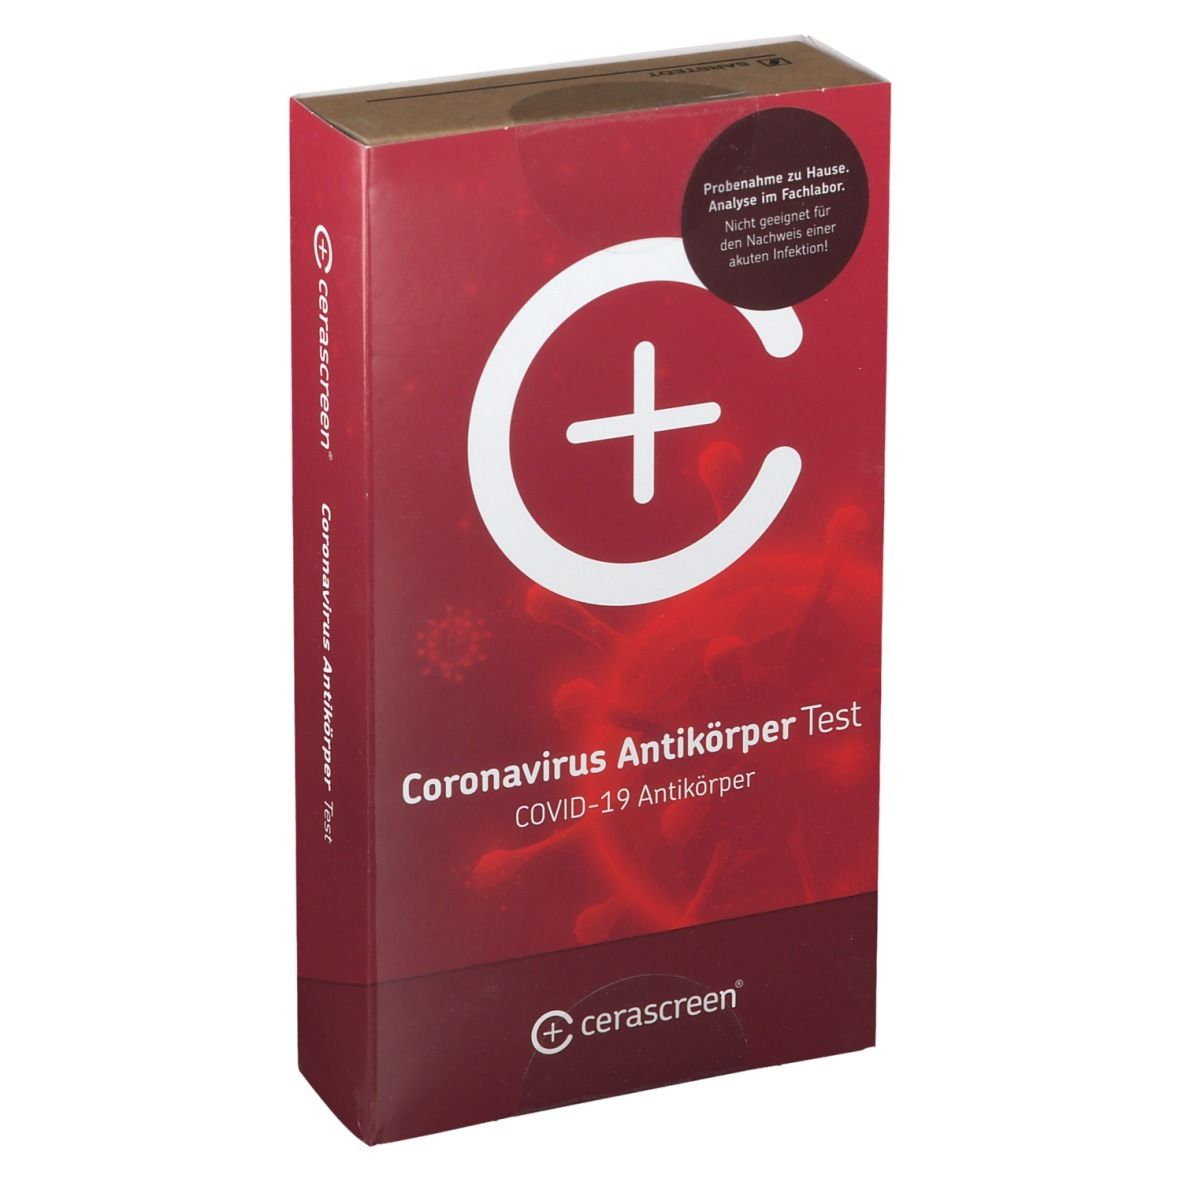 Cerascreen Corona Test